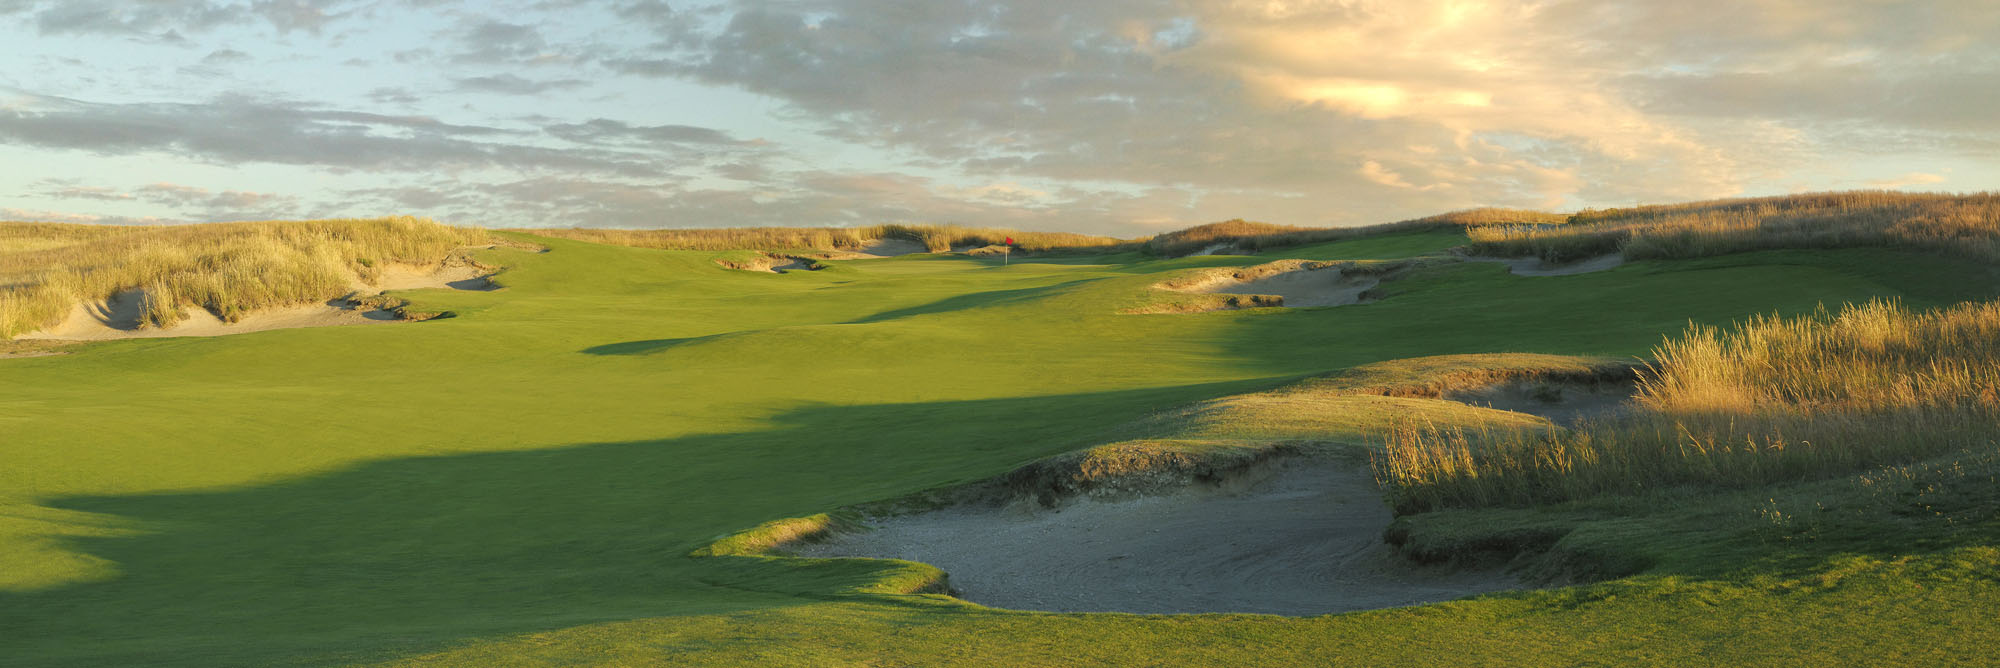 Golf Course Image - The Prairie Club Dunes No. 10